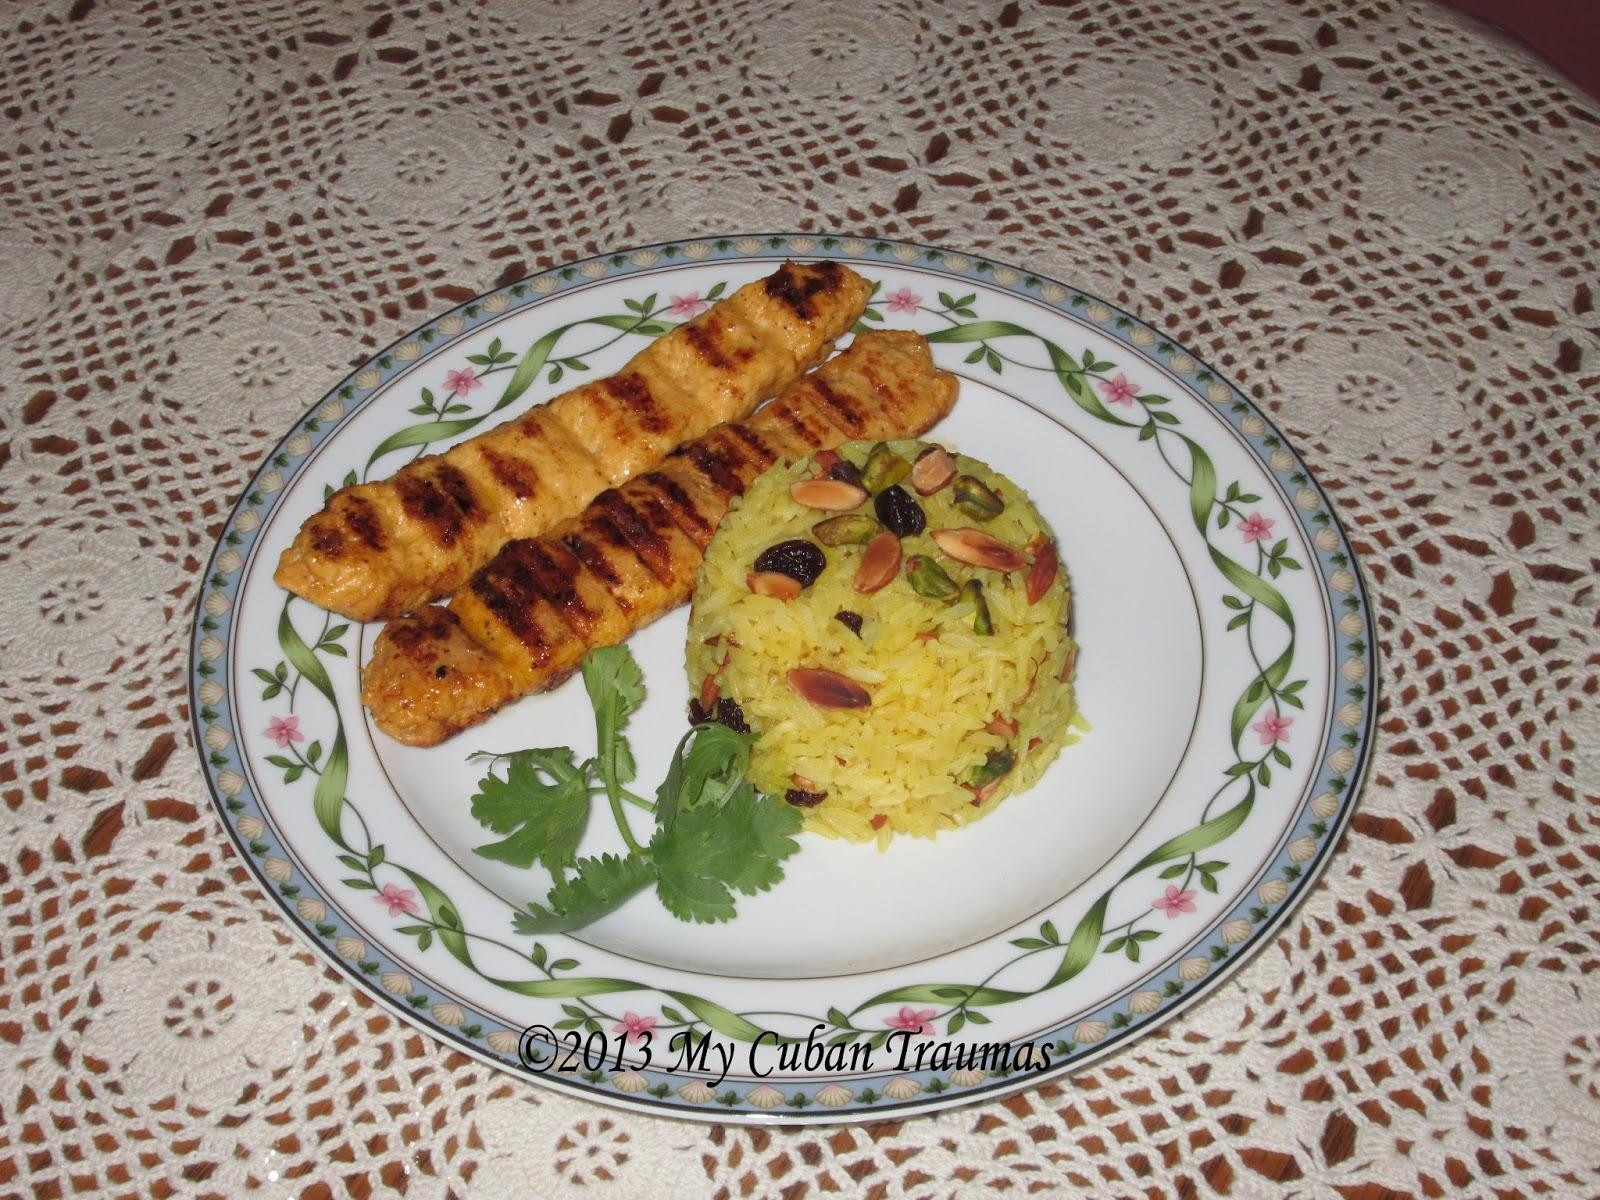 My cuban traumas agosto 2013 for Azafran cuban cuisine